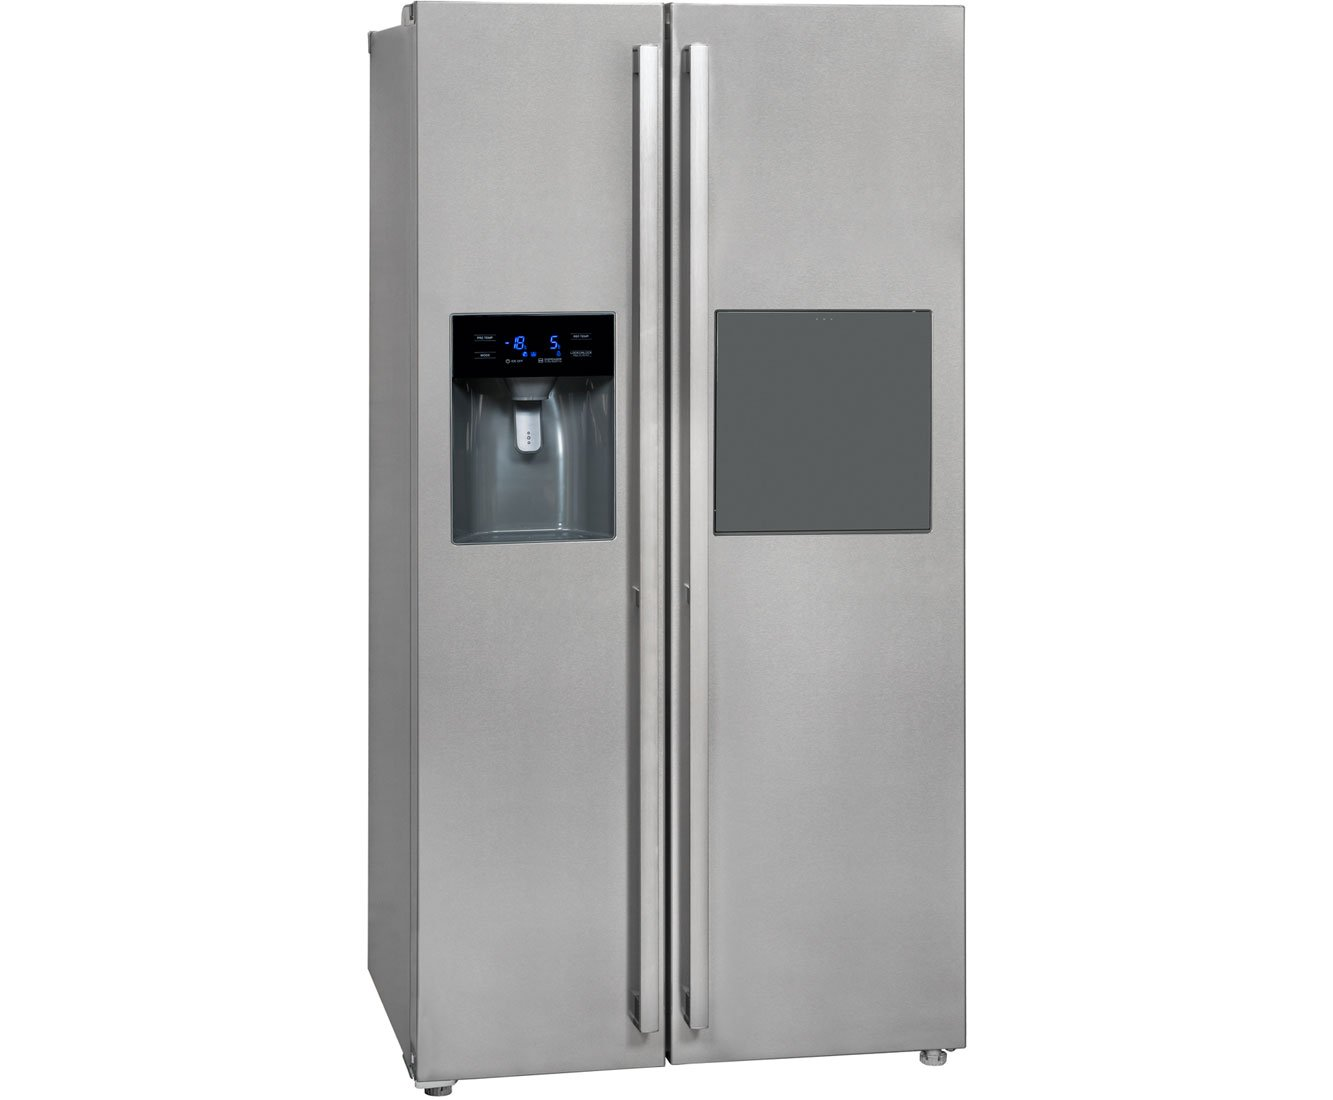 Gorenje Kühlschrank Ablauf Verstopft : Gorenje wasser im kühlschrank: genial ✓️kühlschrank rückwand